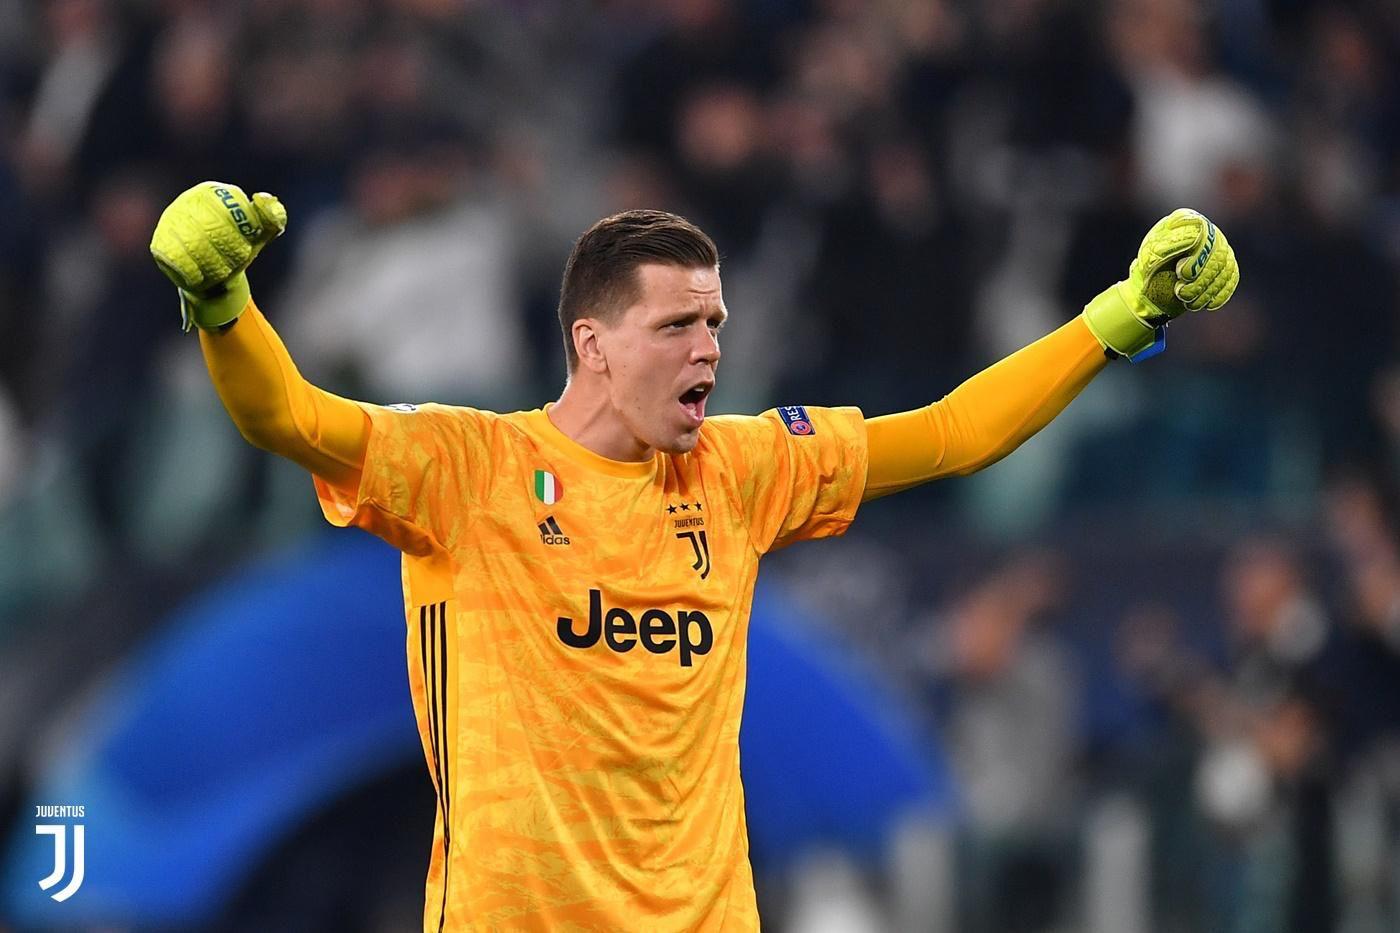 Pin by 𝚞𝚟 on Juventus Sports